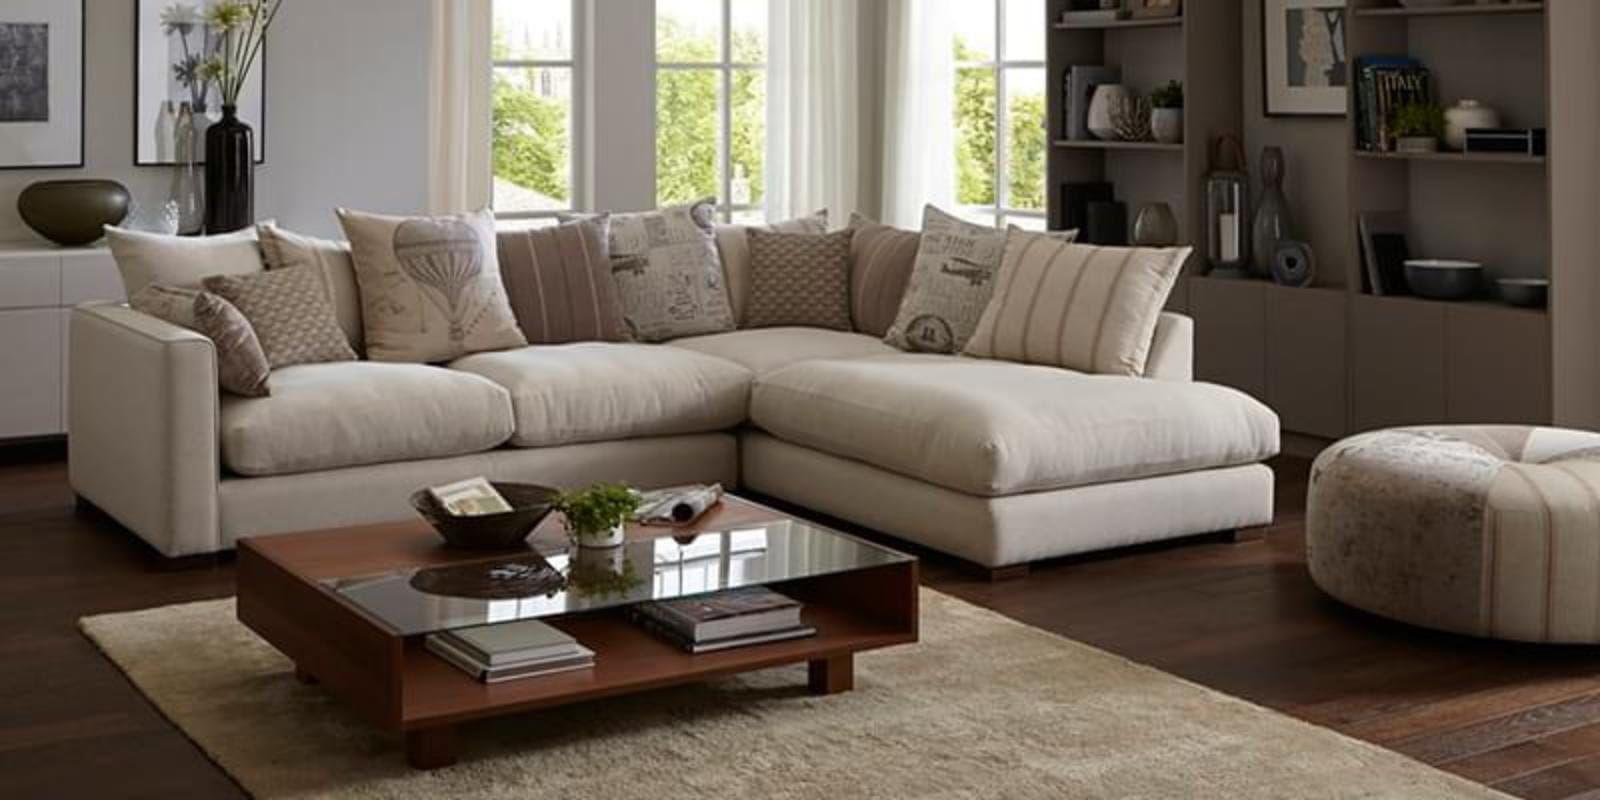 Small Living Room L Shape Sofa In 2020 Corner Sofa Living Room